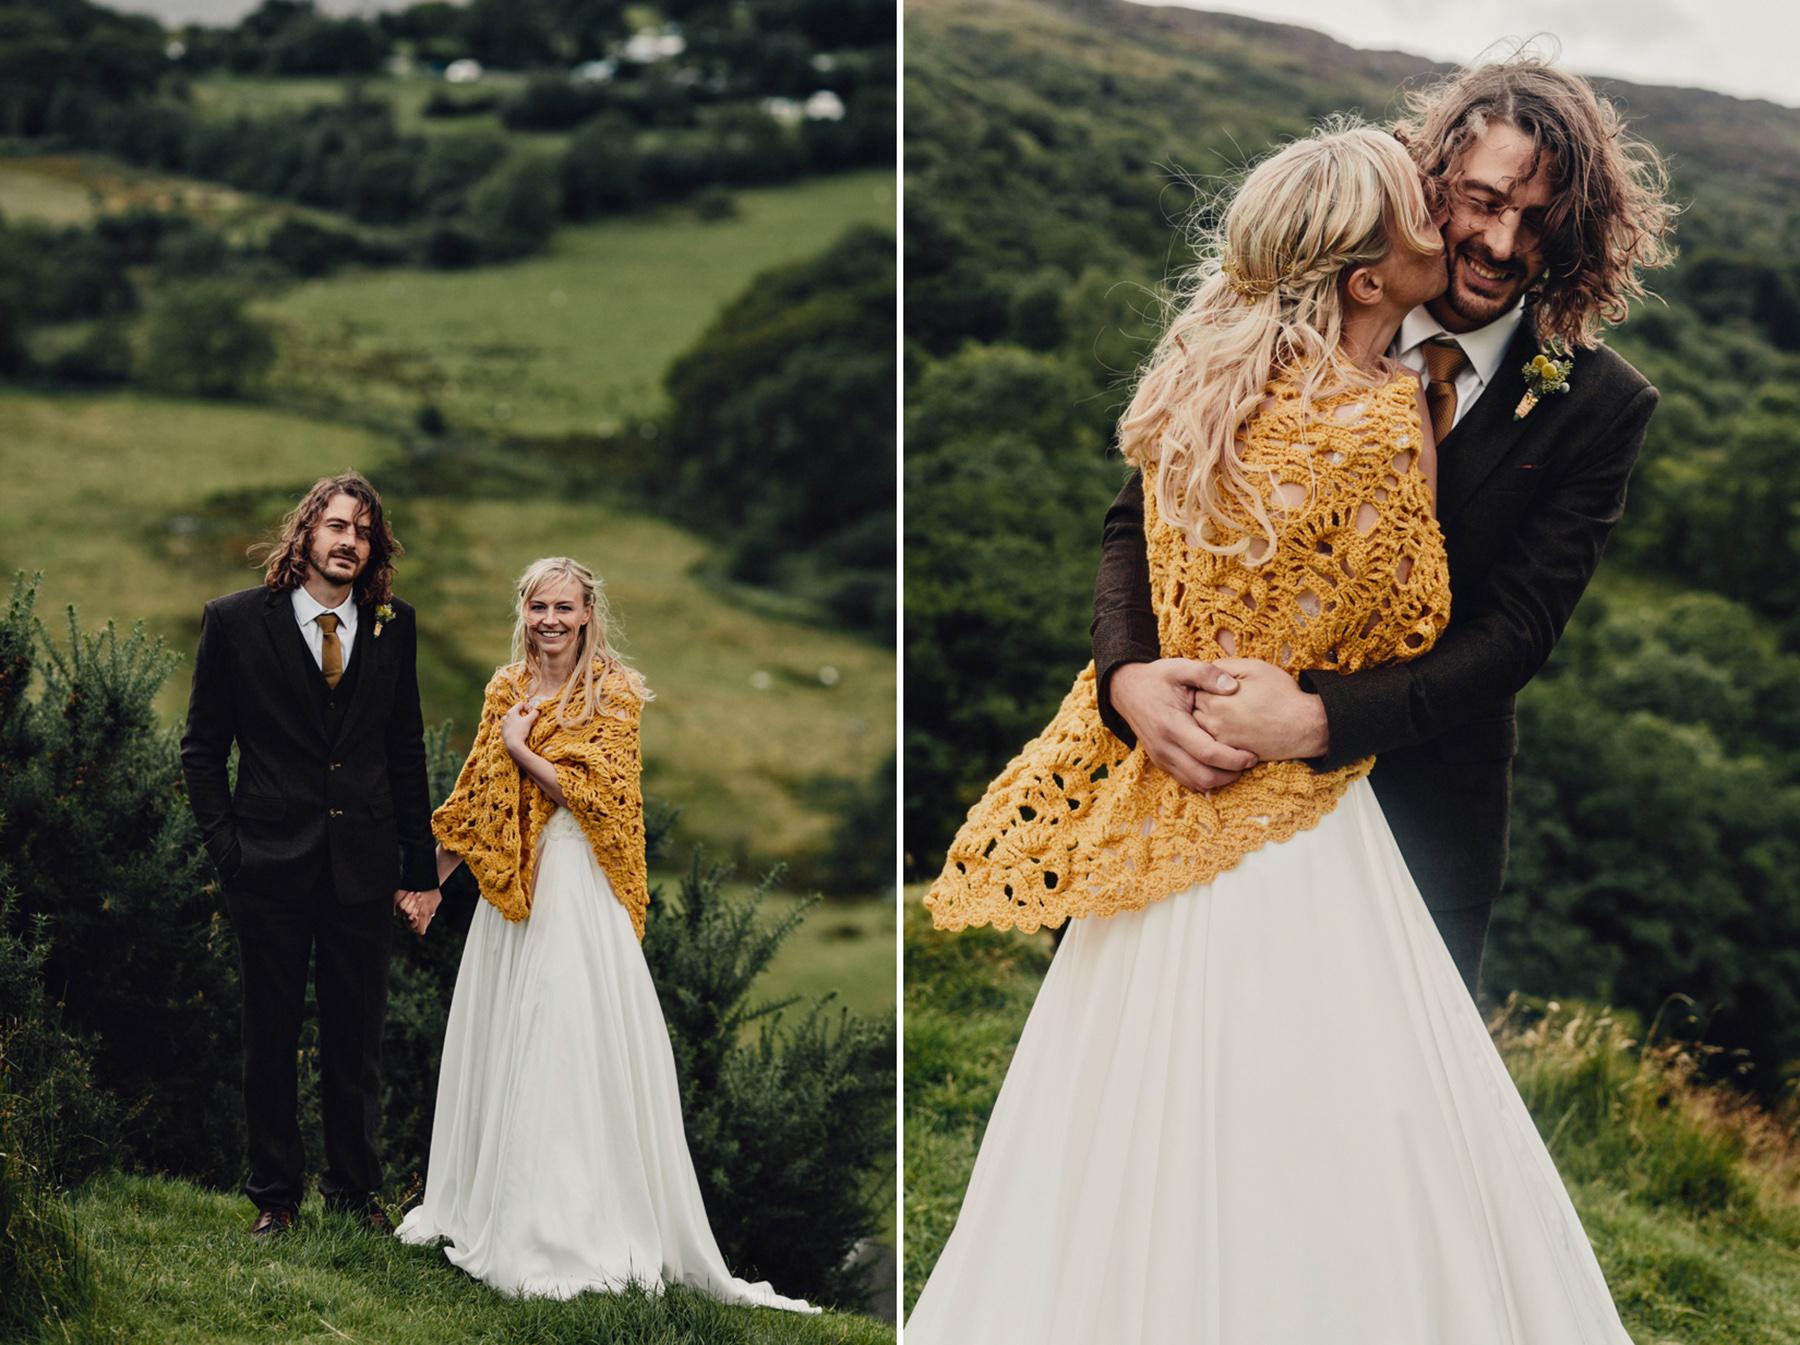 Snowdonia-Wales-Wedding-Photos-0364.jpg